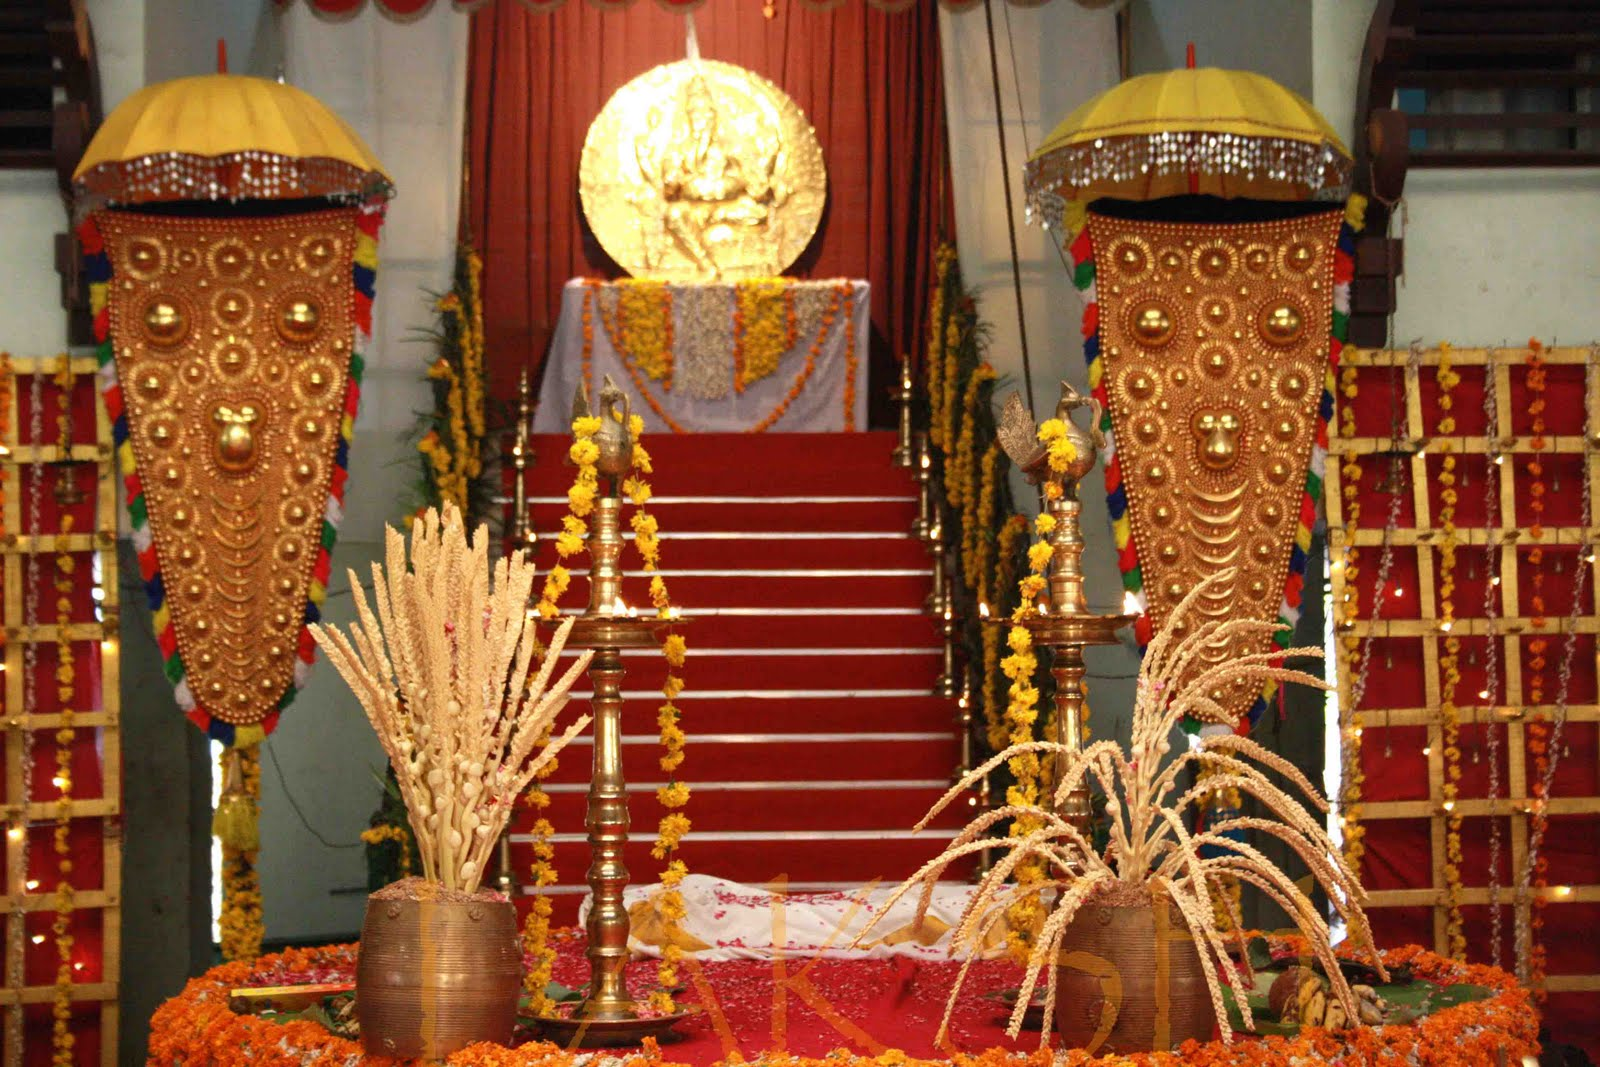 Timika S Blog Indian Wedding Centerpieces